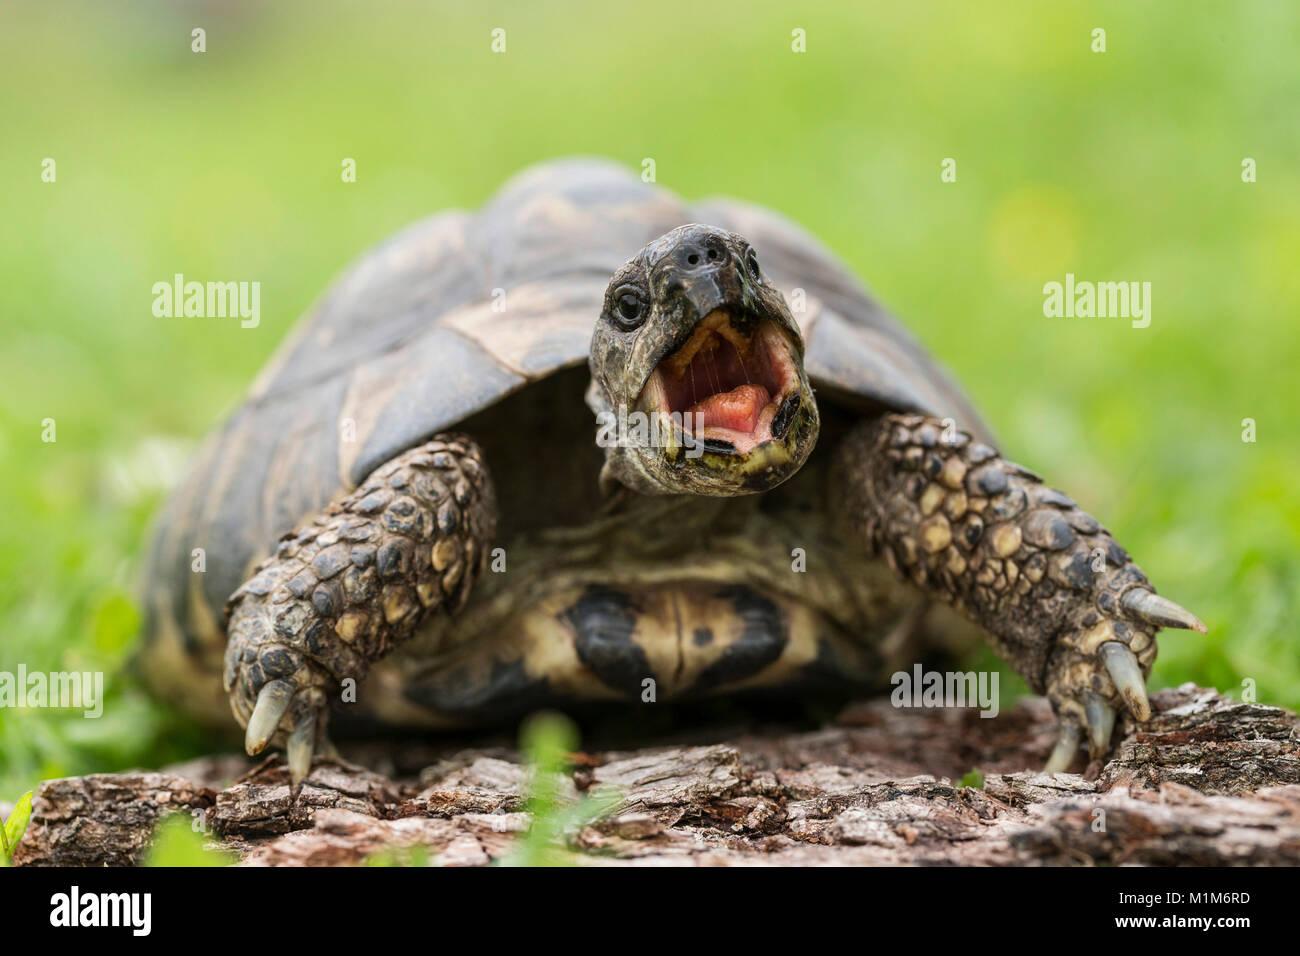 Hermanns Tortoise (Testudo hermanni) on a log, yawning. Germany - Stock Image